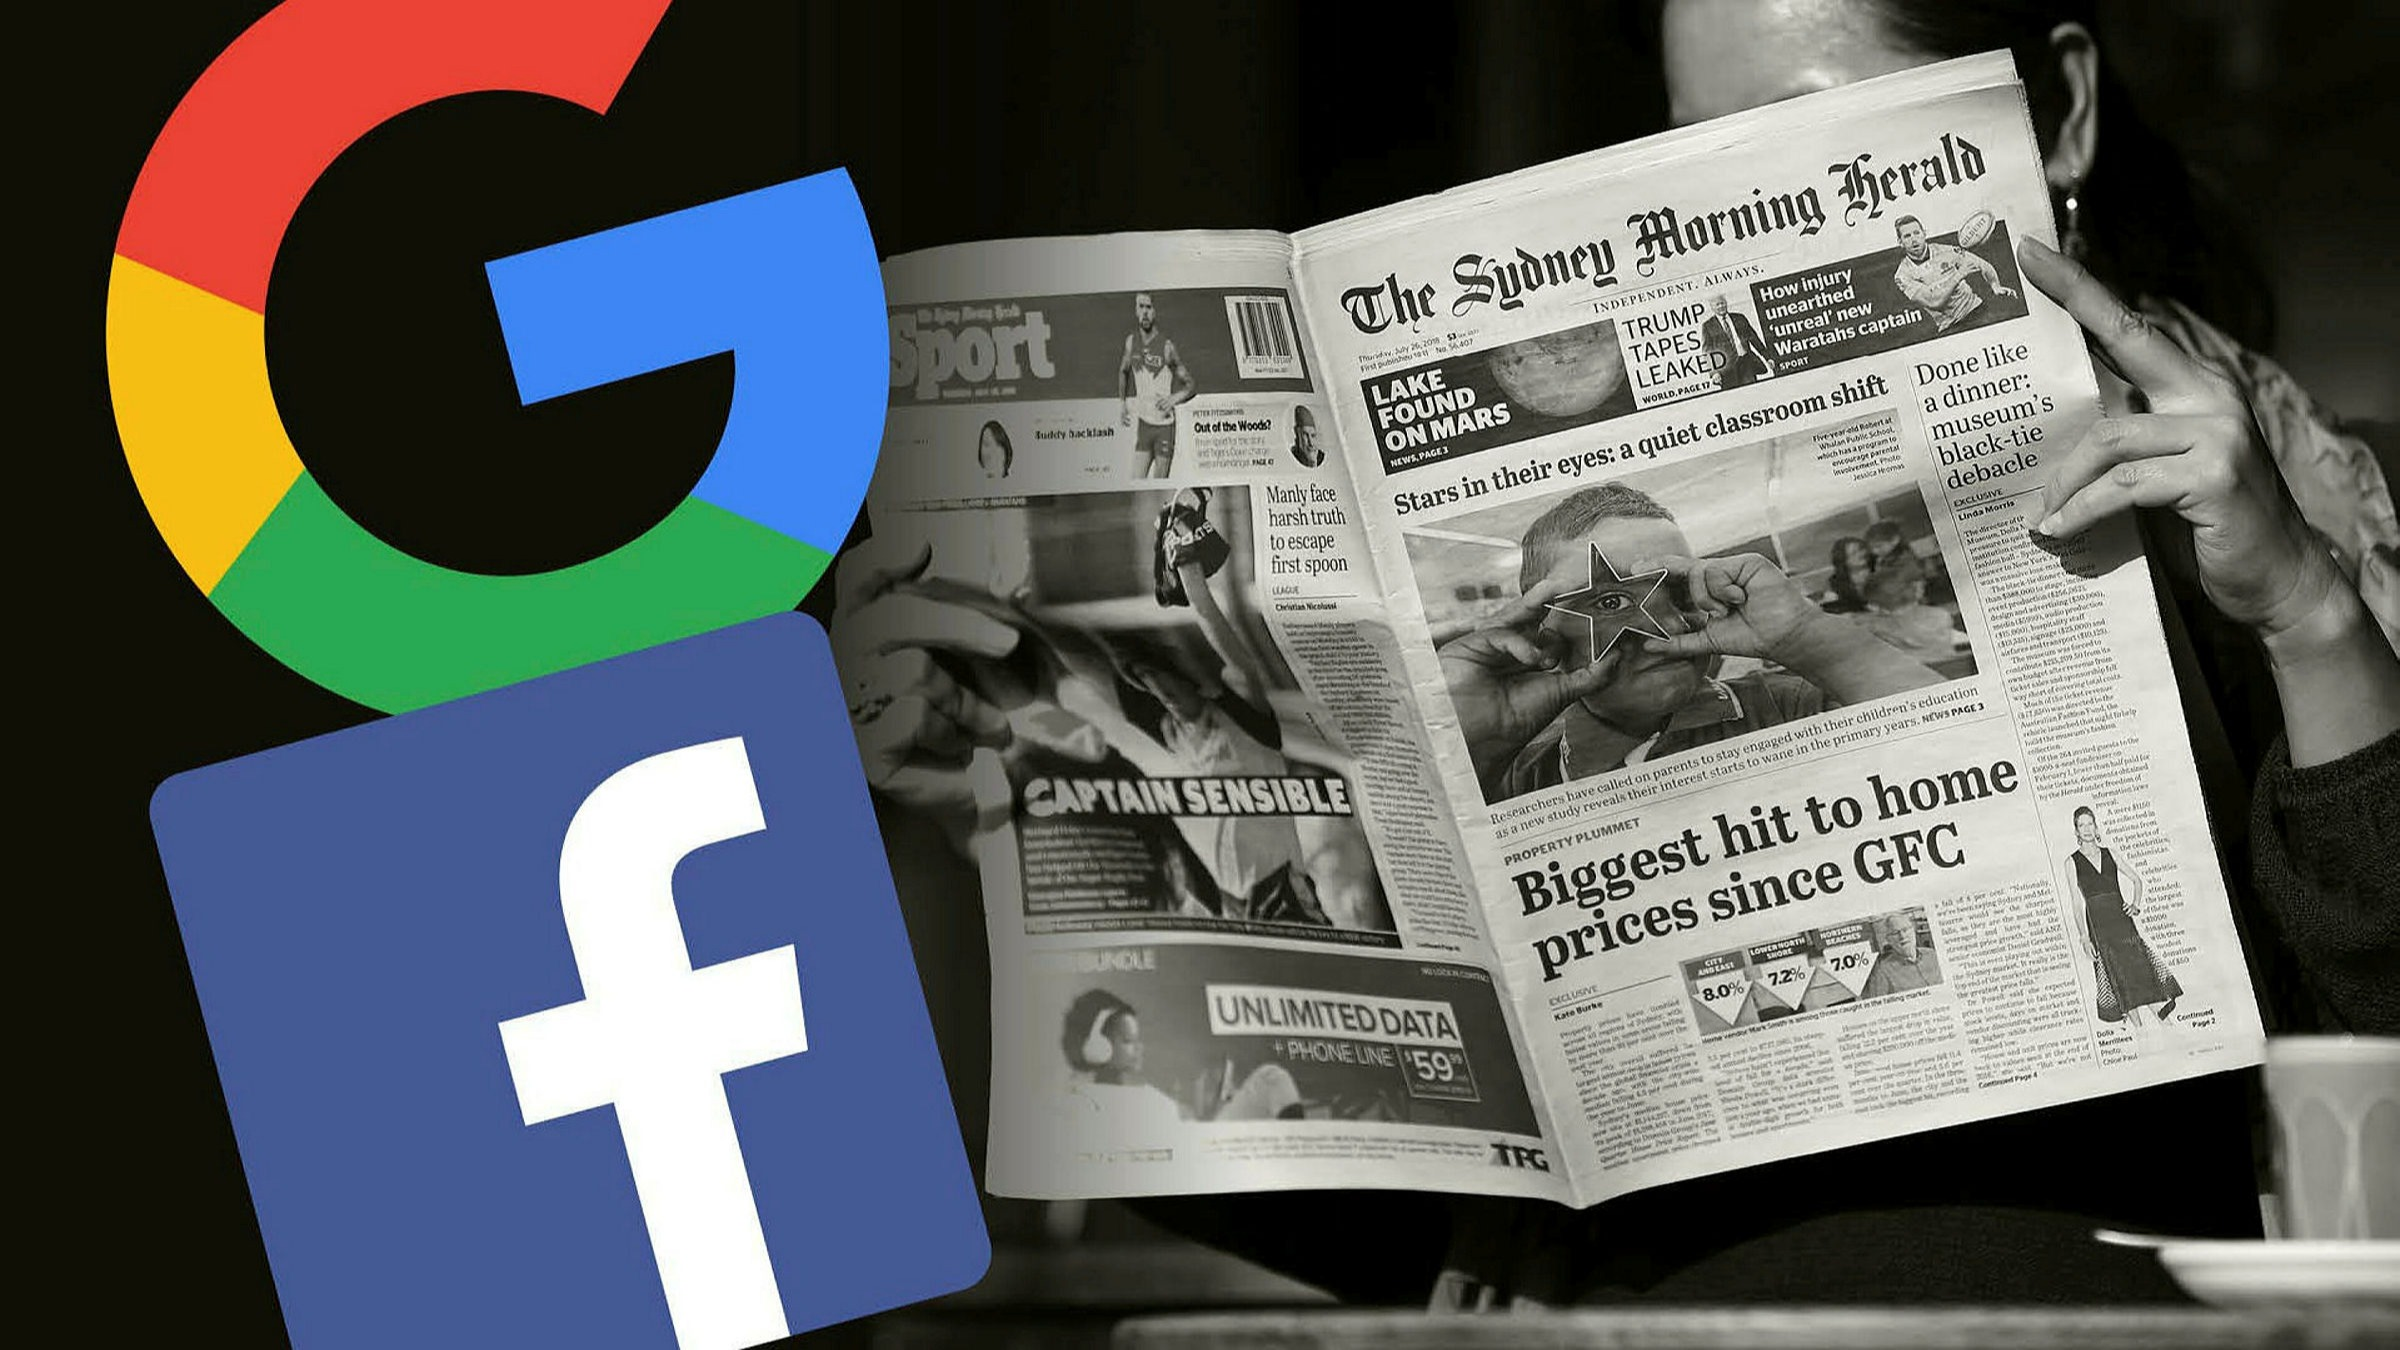 ft.com - Joseph Stiglitz - Australia's new tech code is a road worth exploring